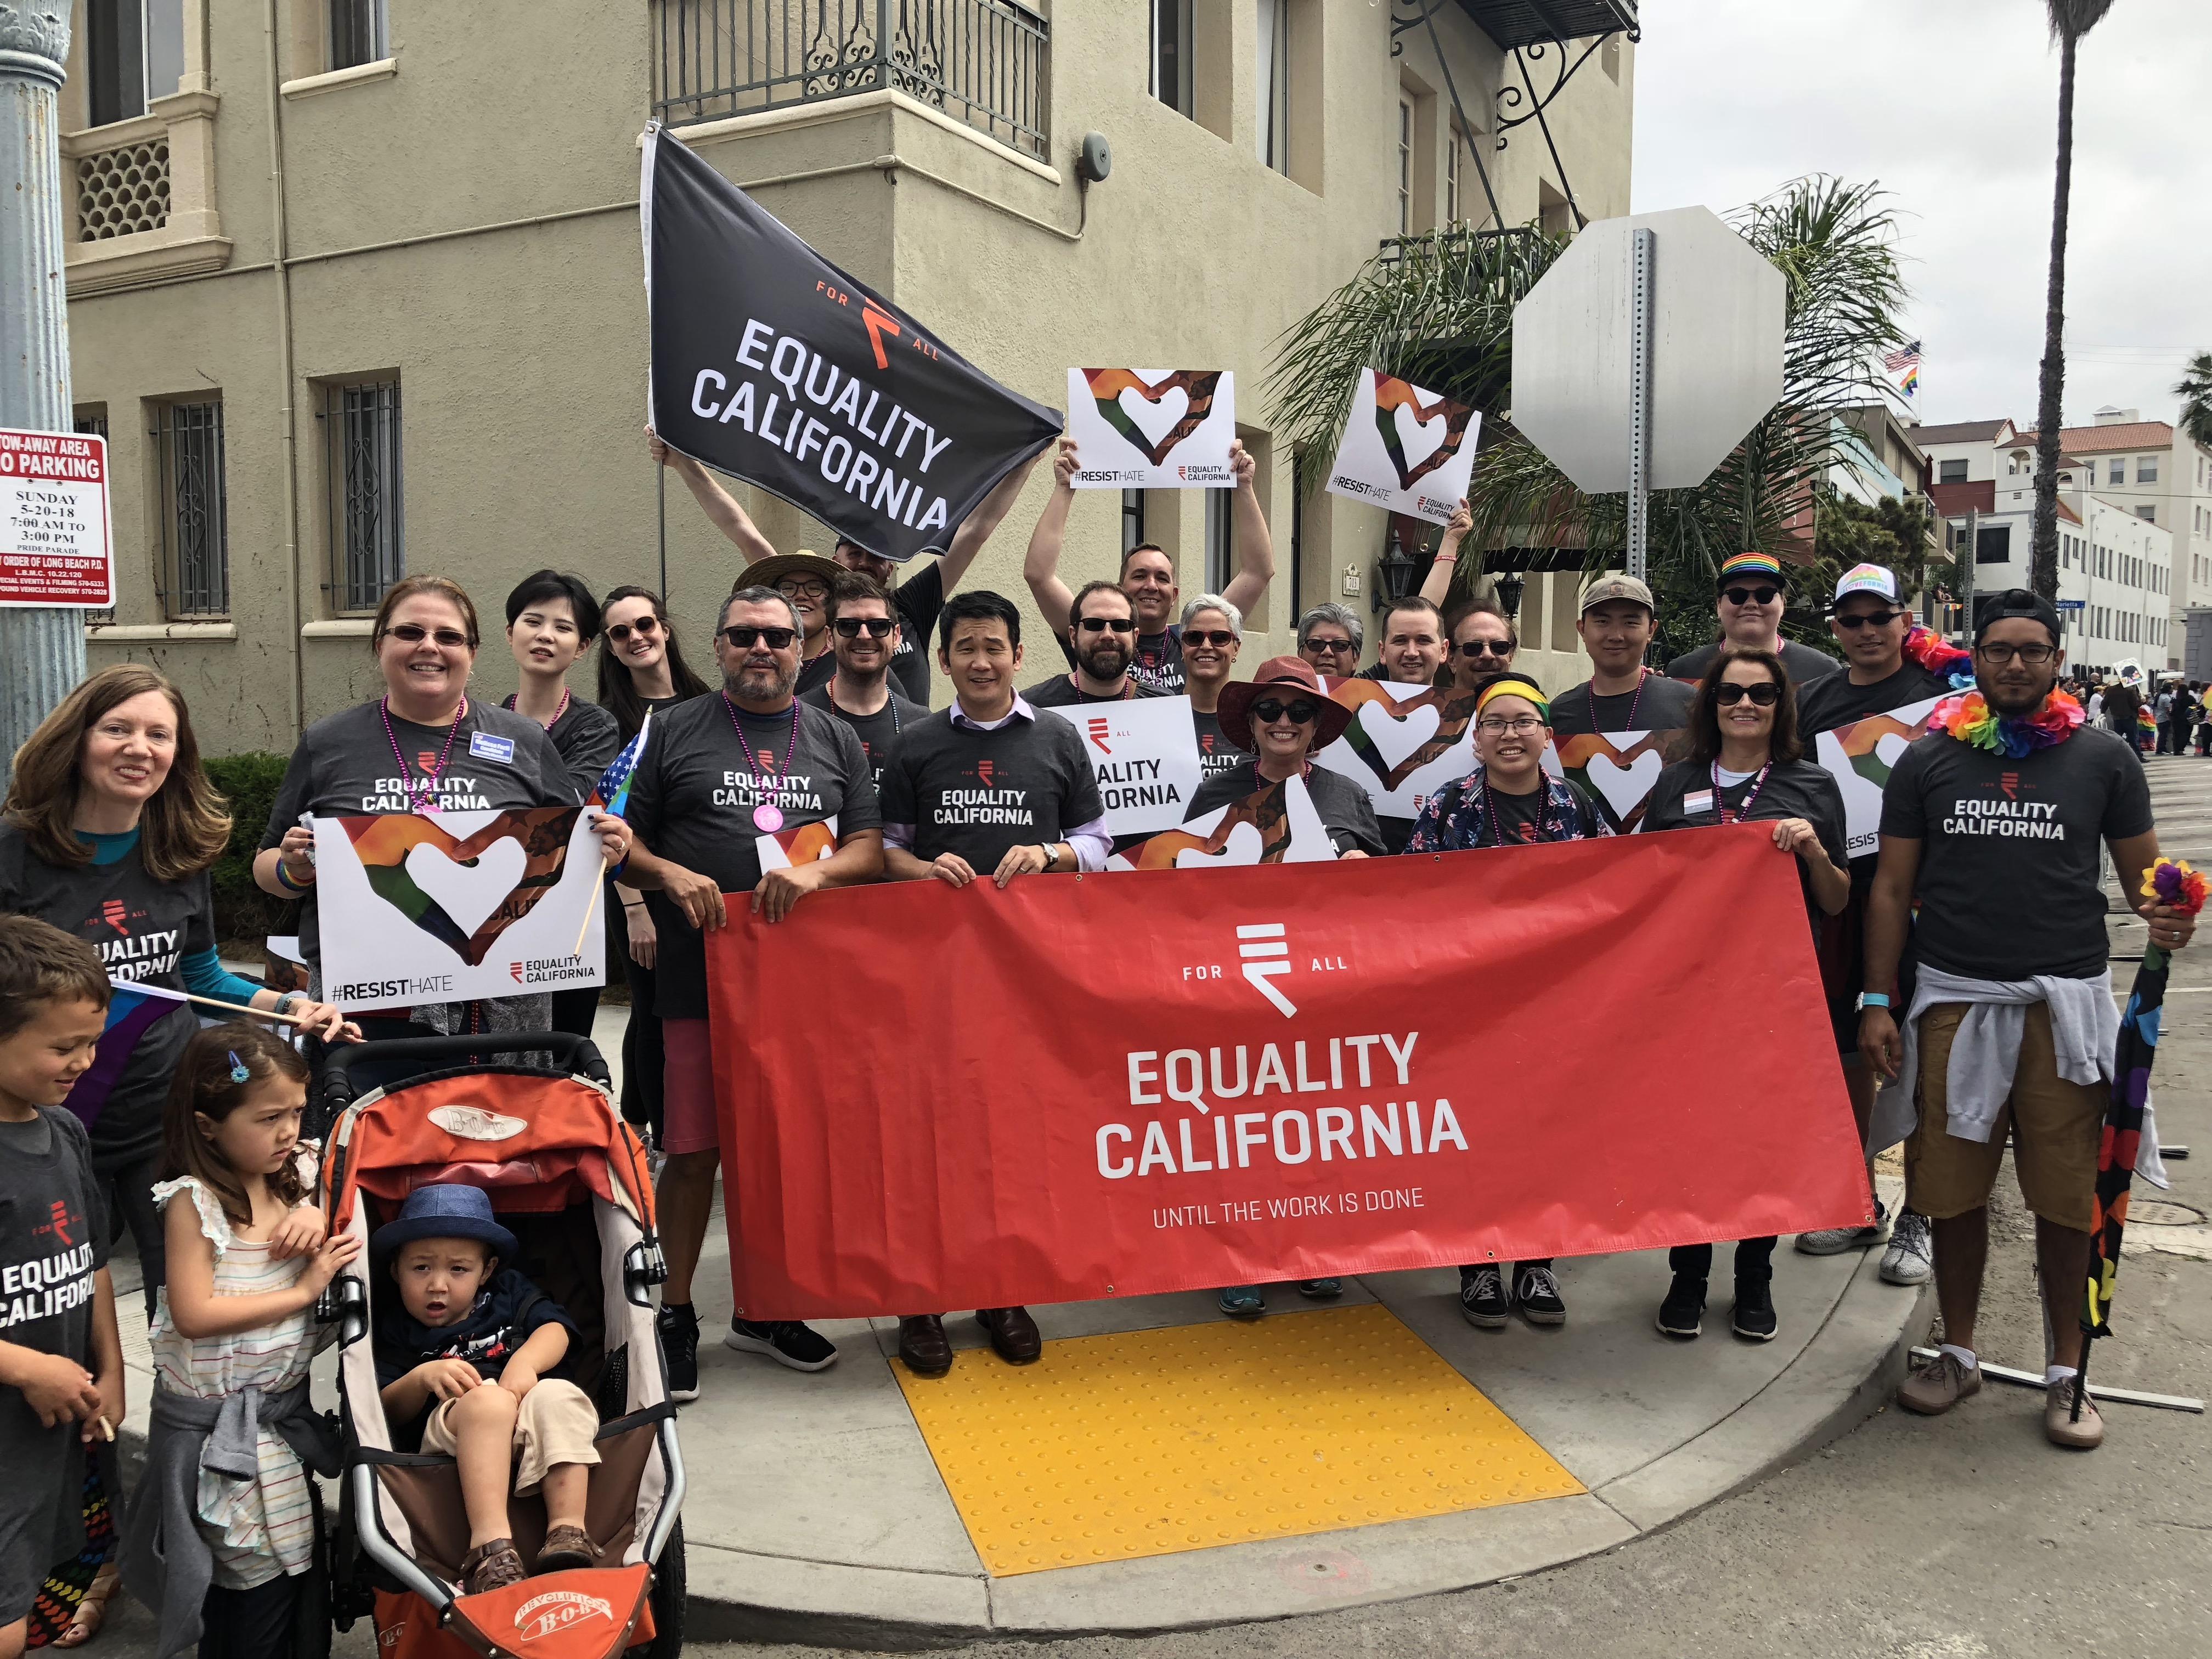 Parade participants Long Beach Pride